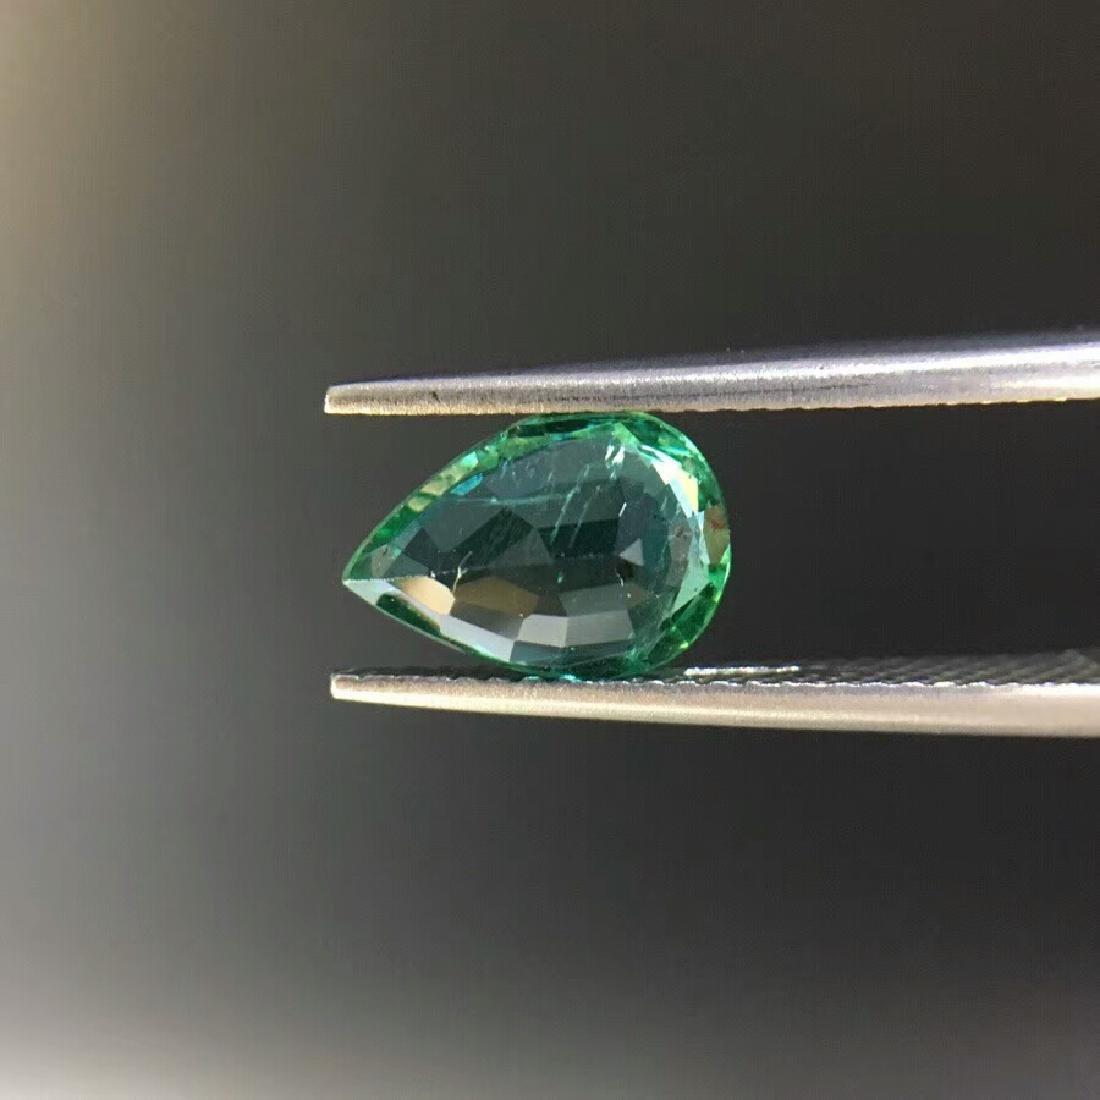 1.57 ct Emerald 6.8*9.6*4.0 mm Pear Cut - 3